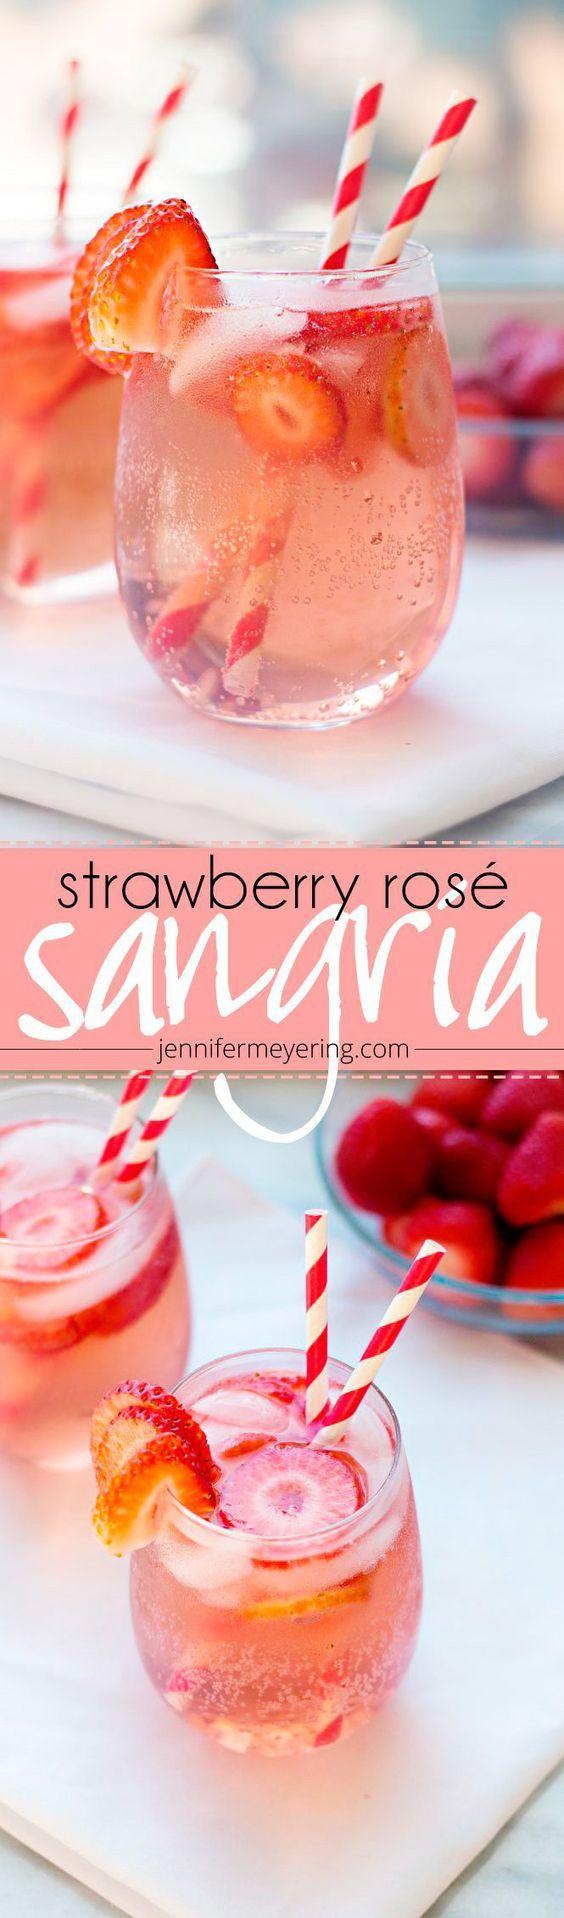 Strawberry Rosé Sangria. Try with an award-winning Missouri rosé wine!